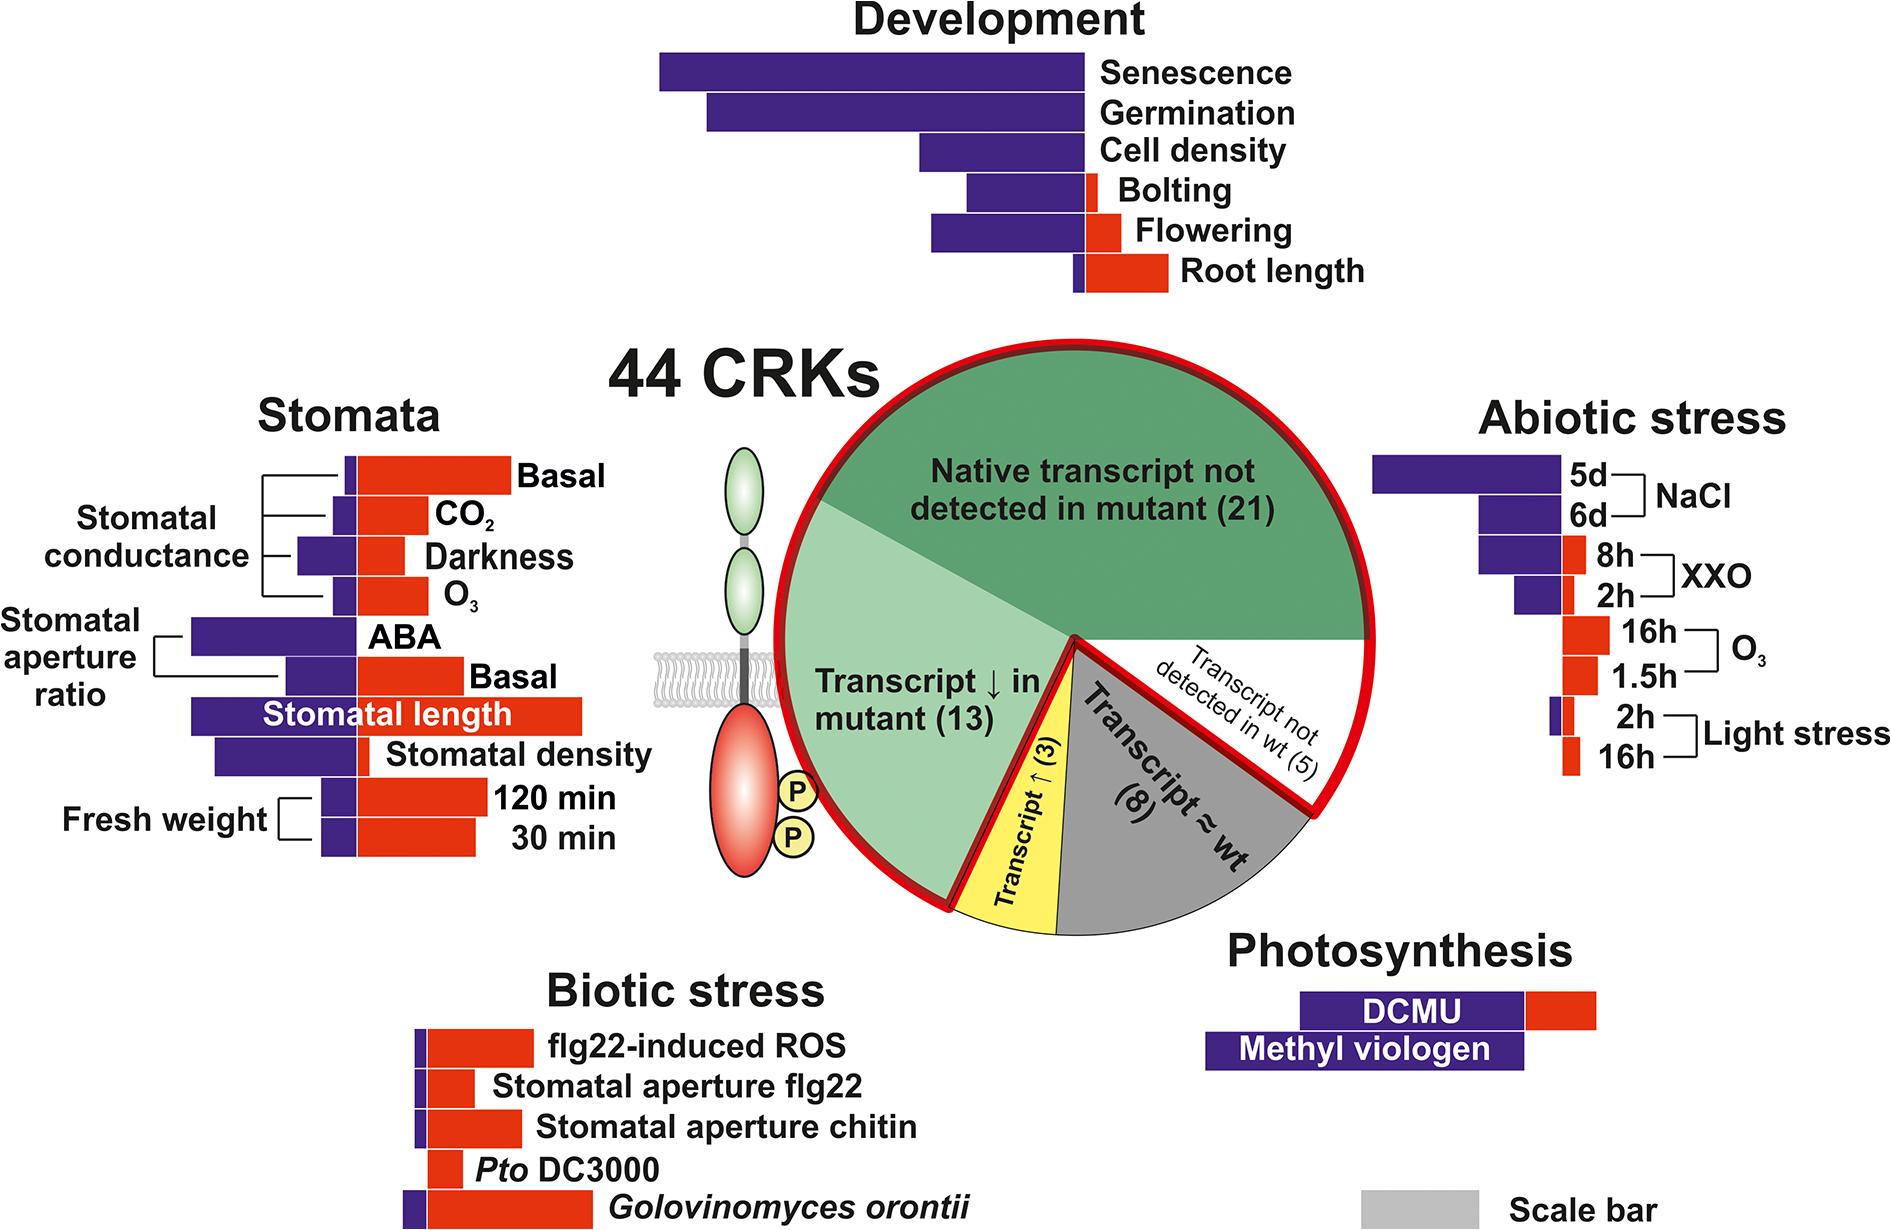 Phenotypic analysis of the <i>Arabidopsis thaliana</i> CRK protein family.